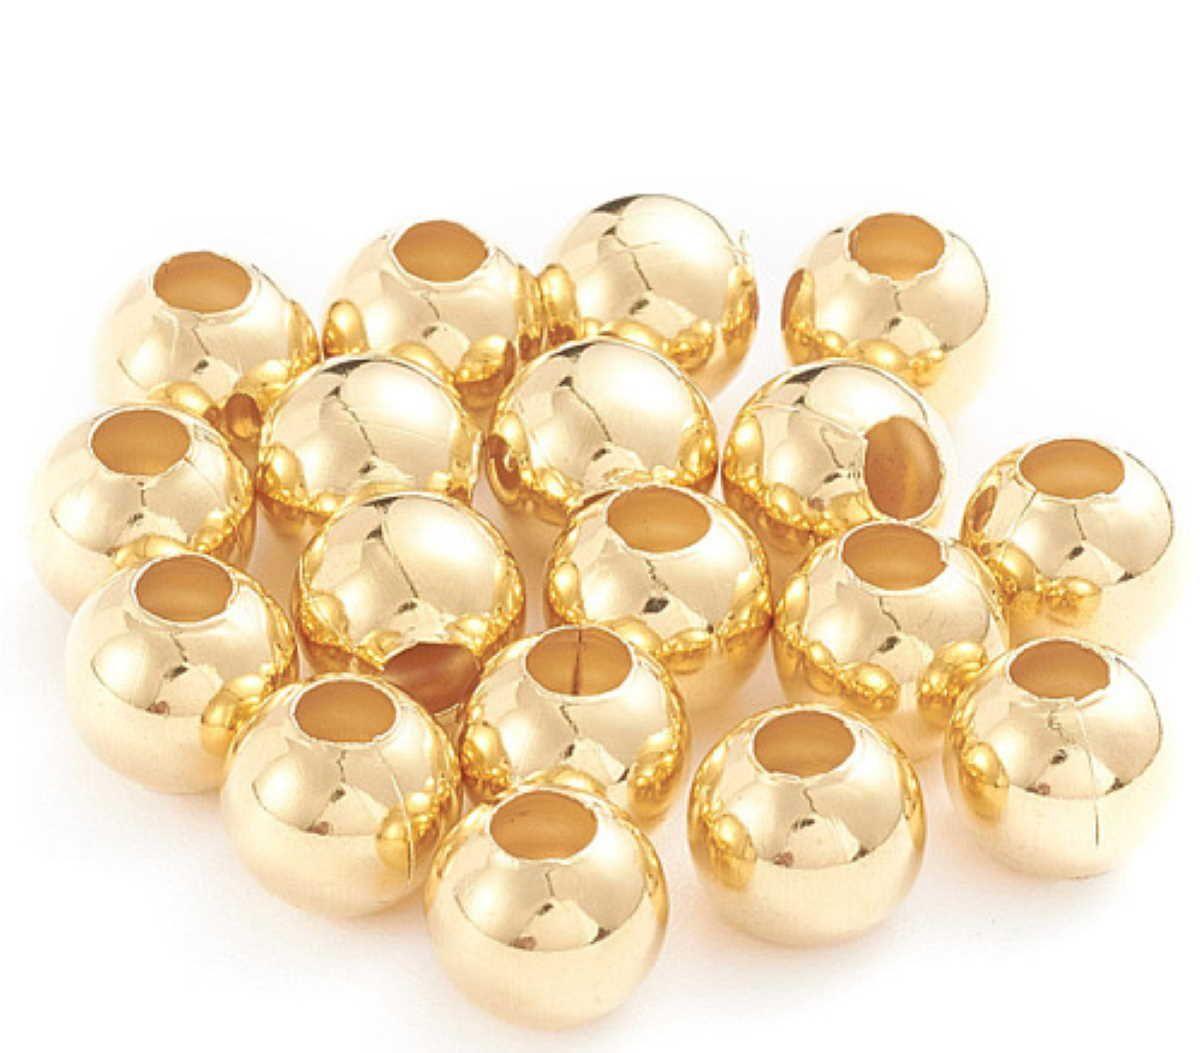 Edelstahlperlen Gold, Durchmesser wählbar